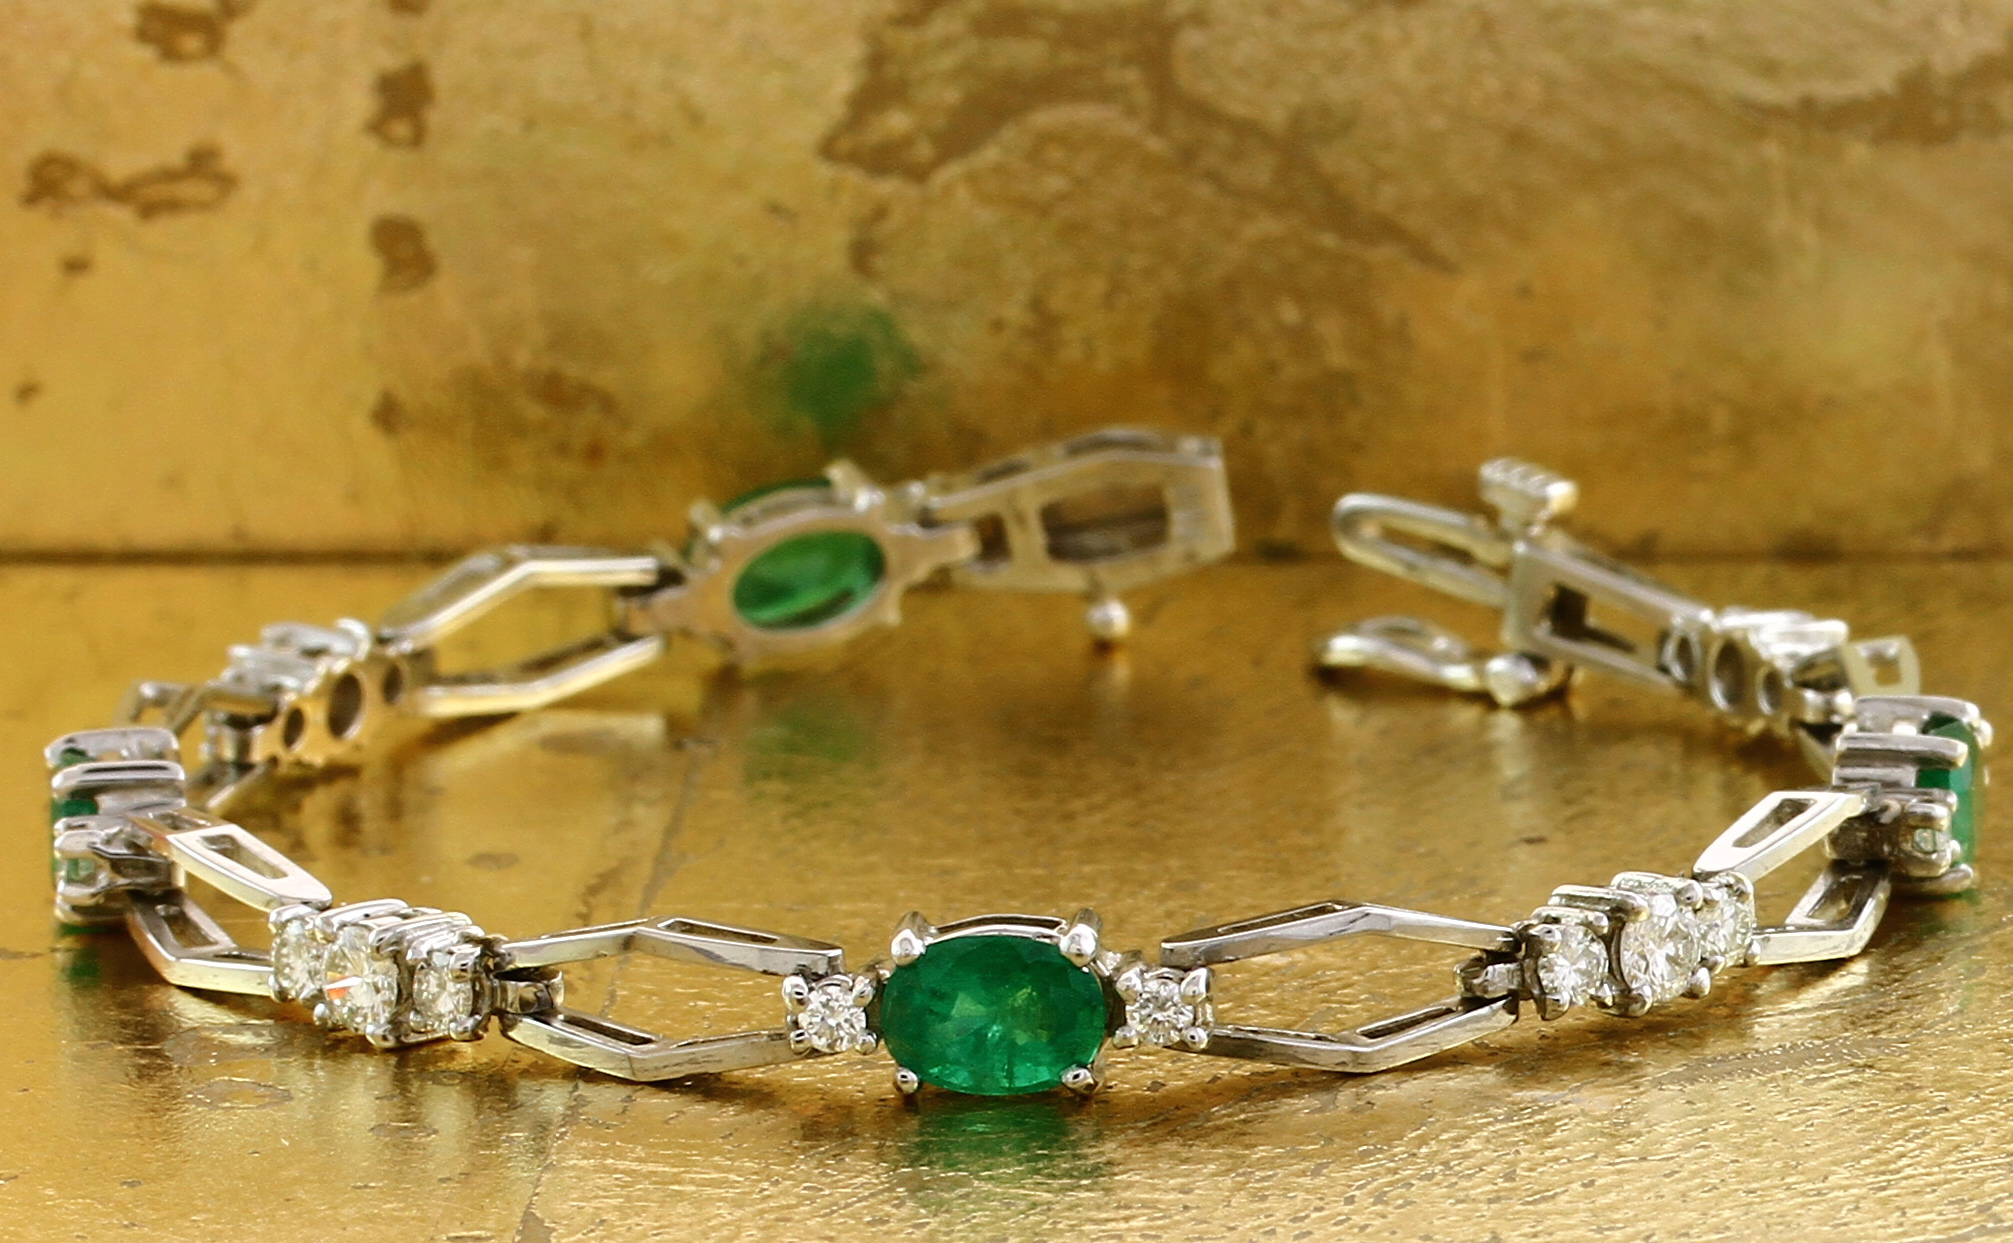 Tennis Bracelet with Oval Emeralds & Round Diamonds - Item No: 0010616